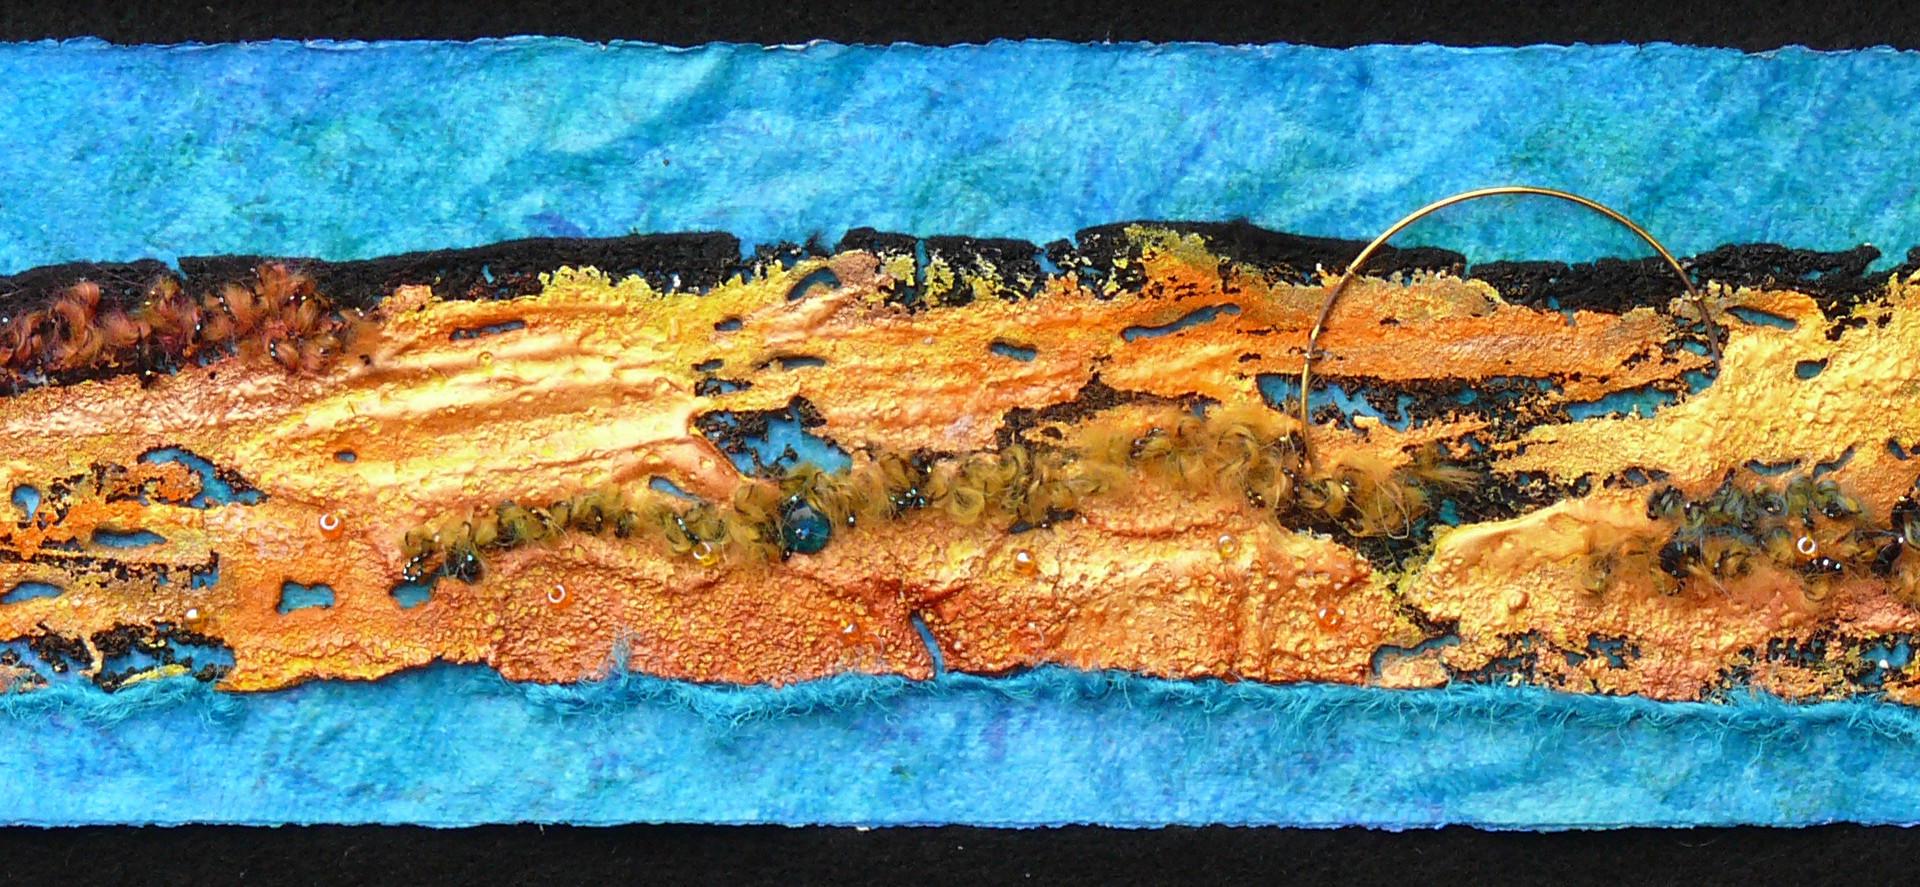 CANYON SUNSET, 2 / GORGE DORÉE 2.jpg